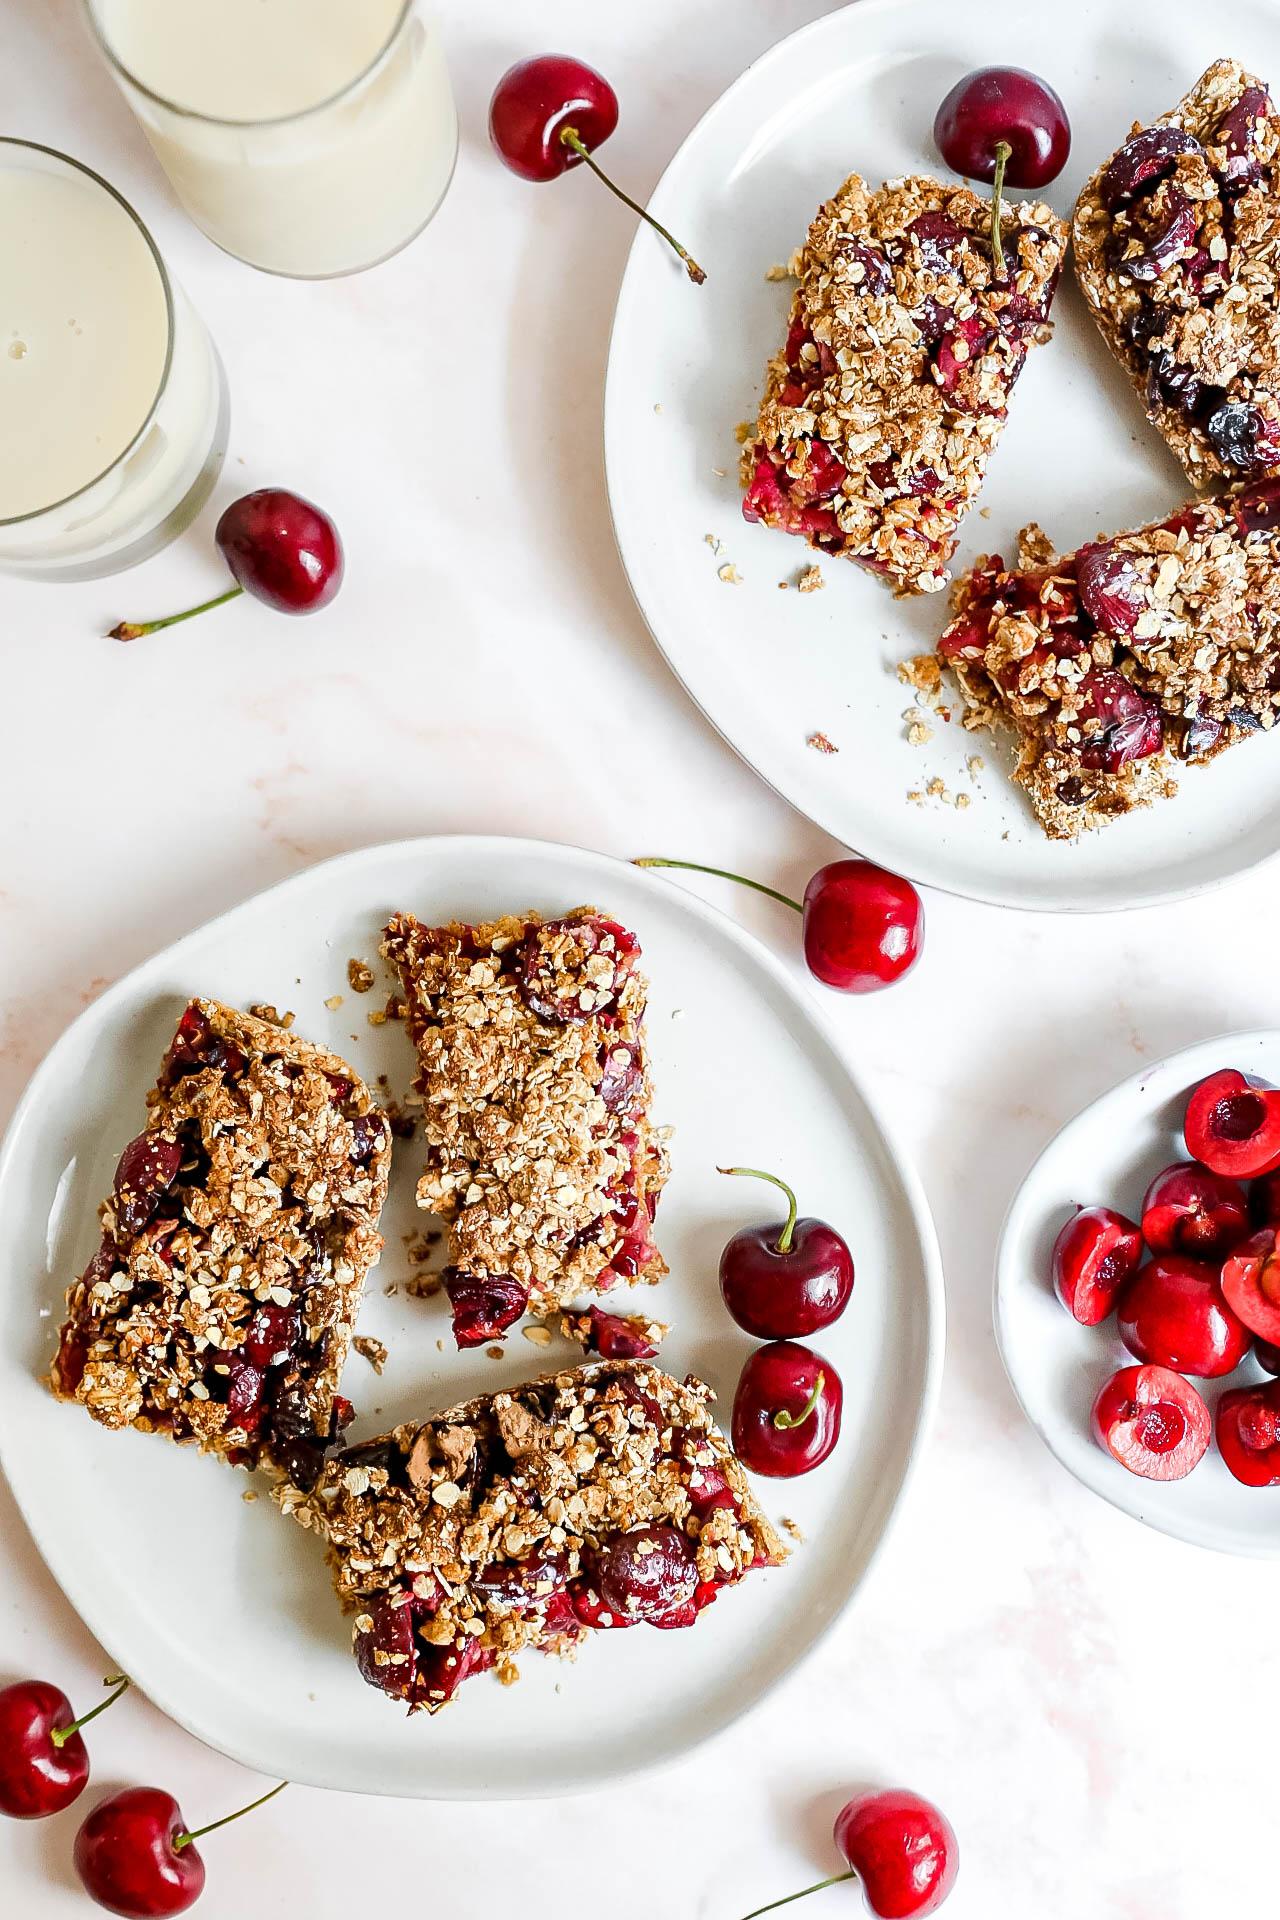 Plant-Based Cherry Crumble Bars